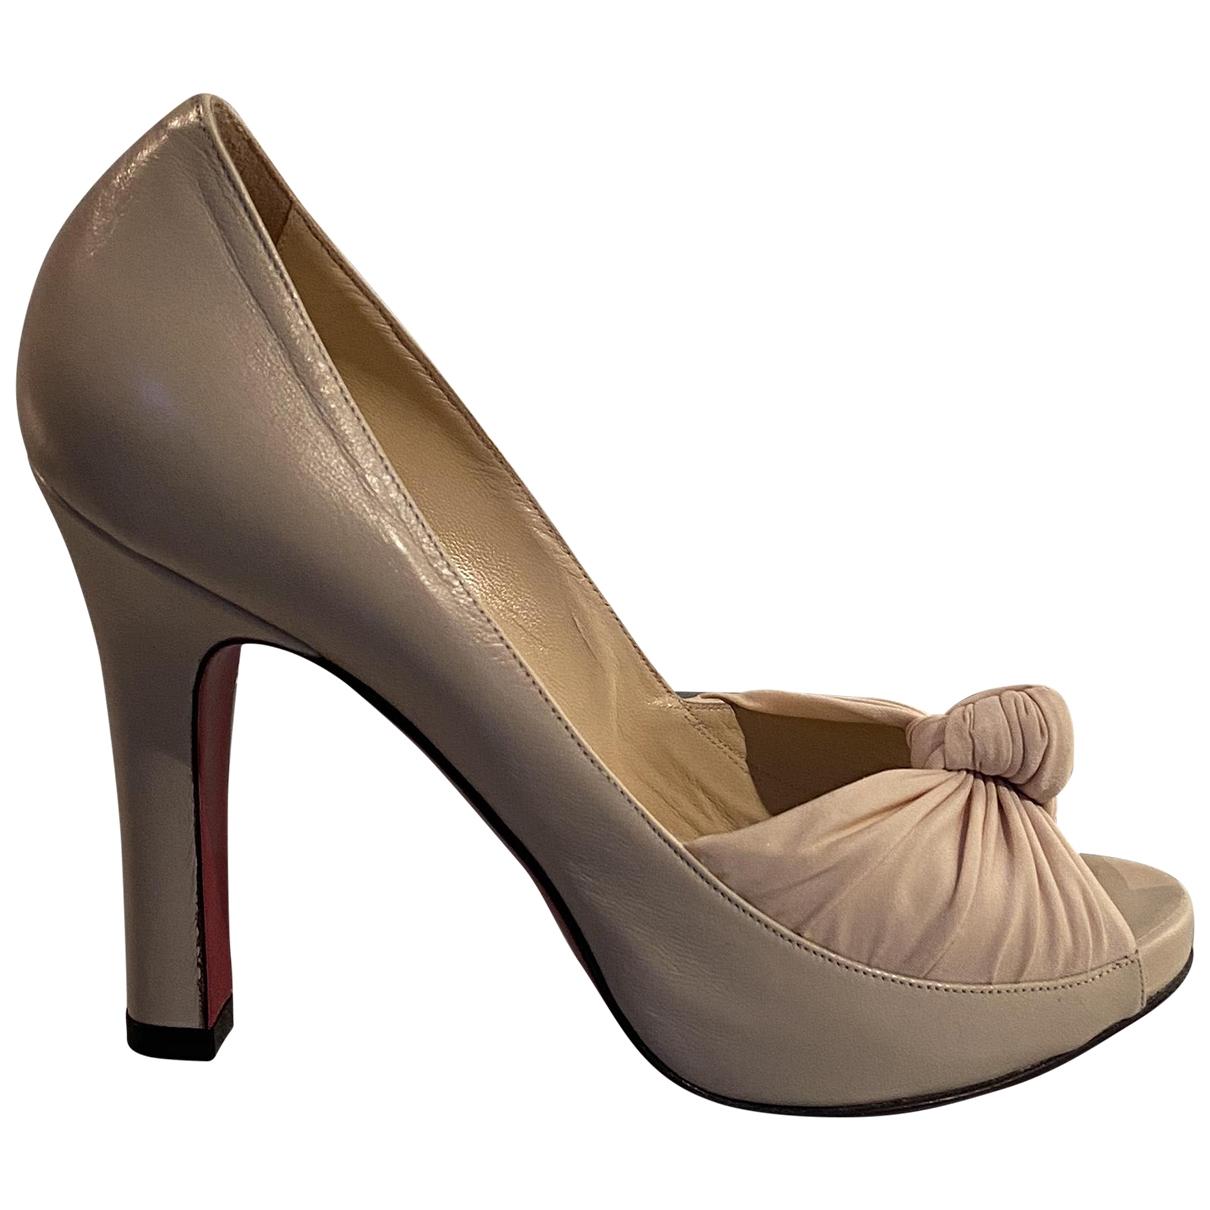 Luciano Padovan \N Beige Leather Heels for Women 37 IT